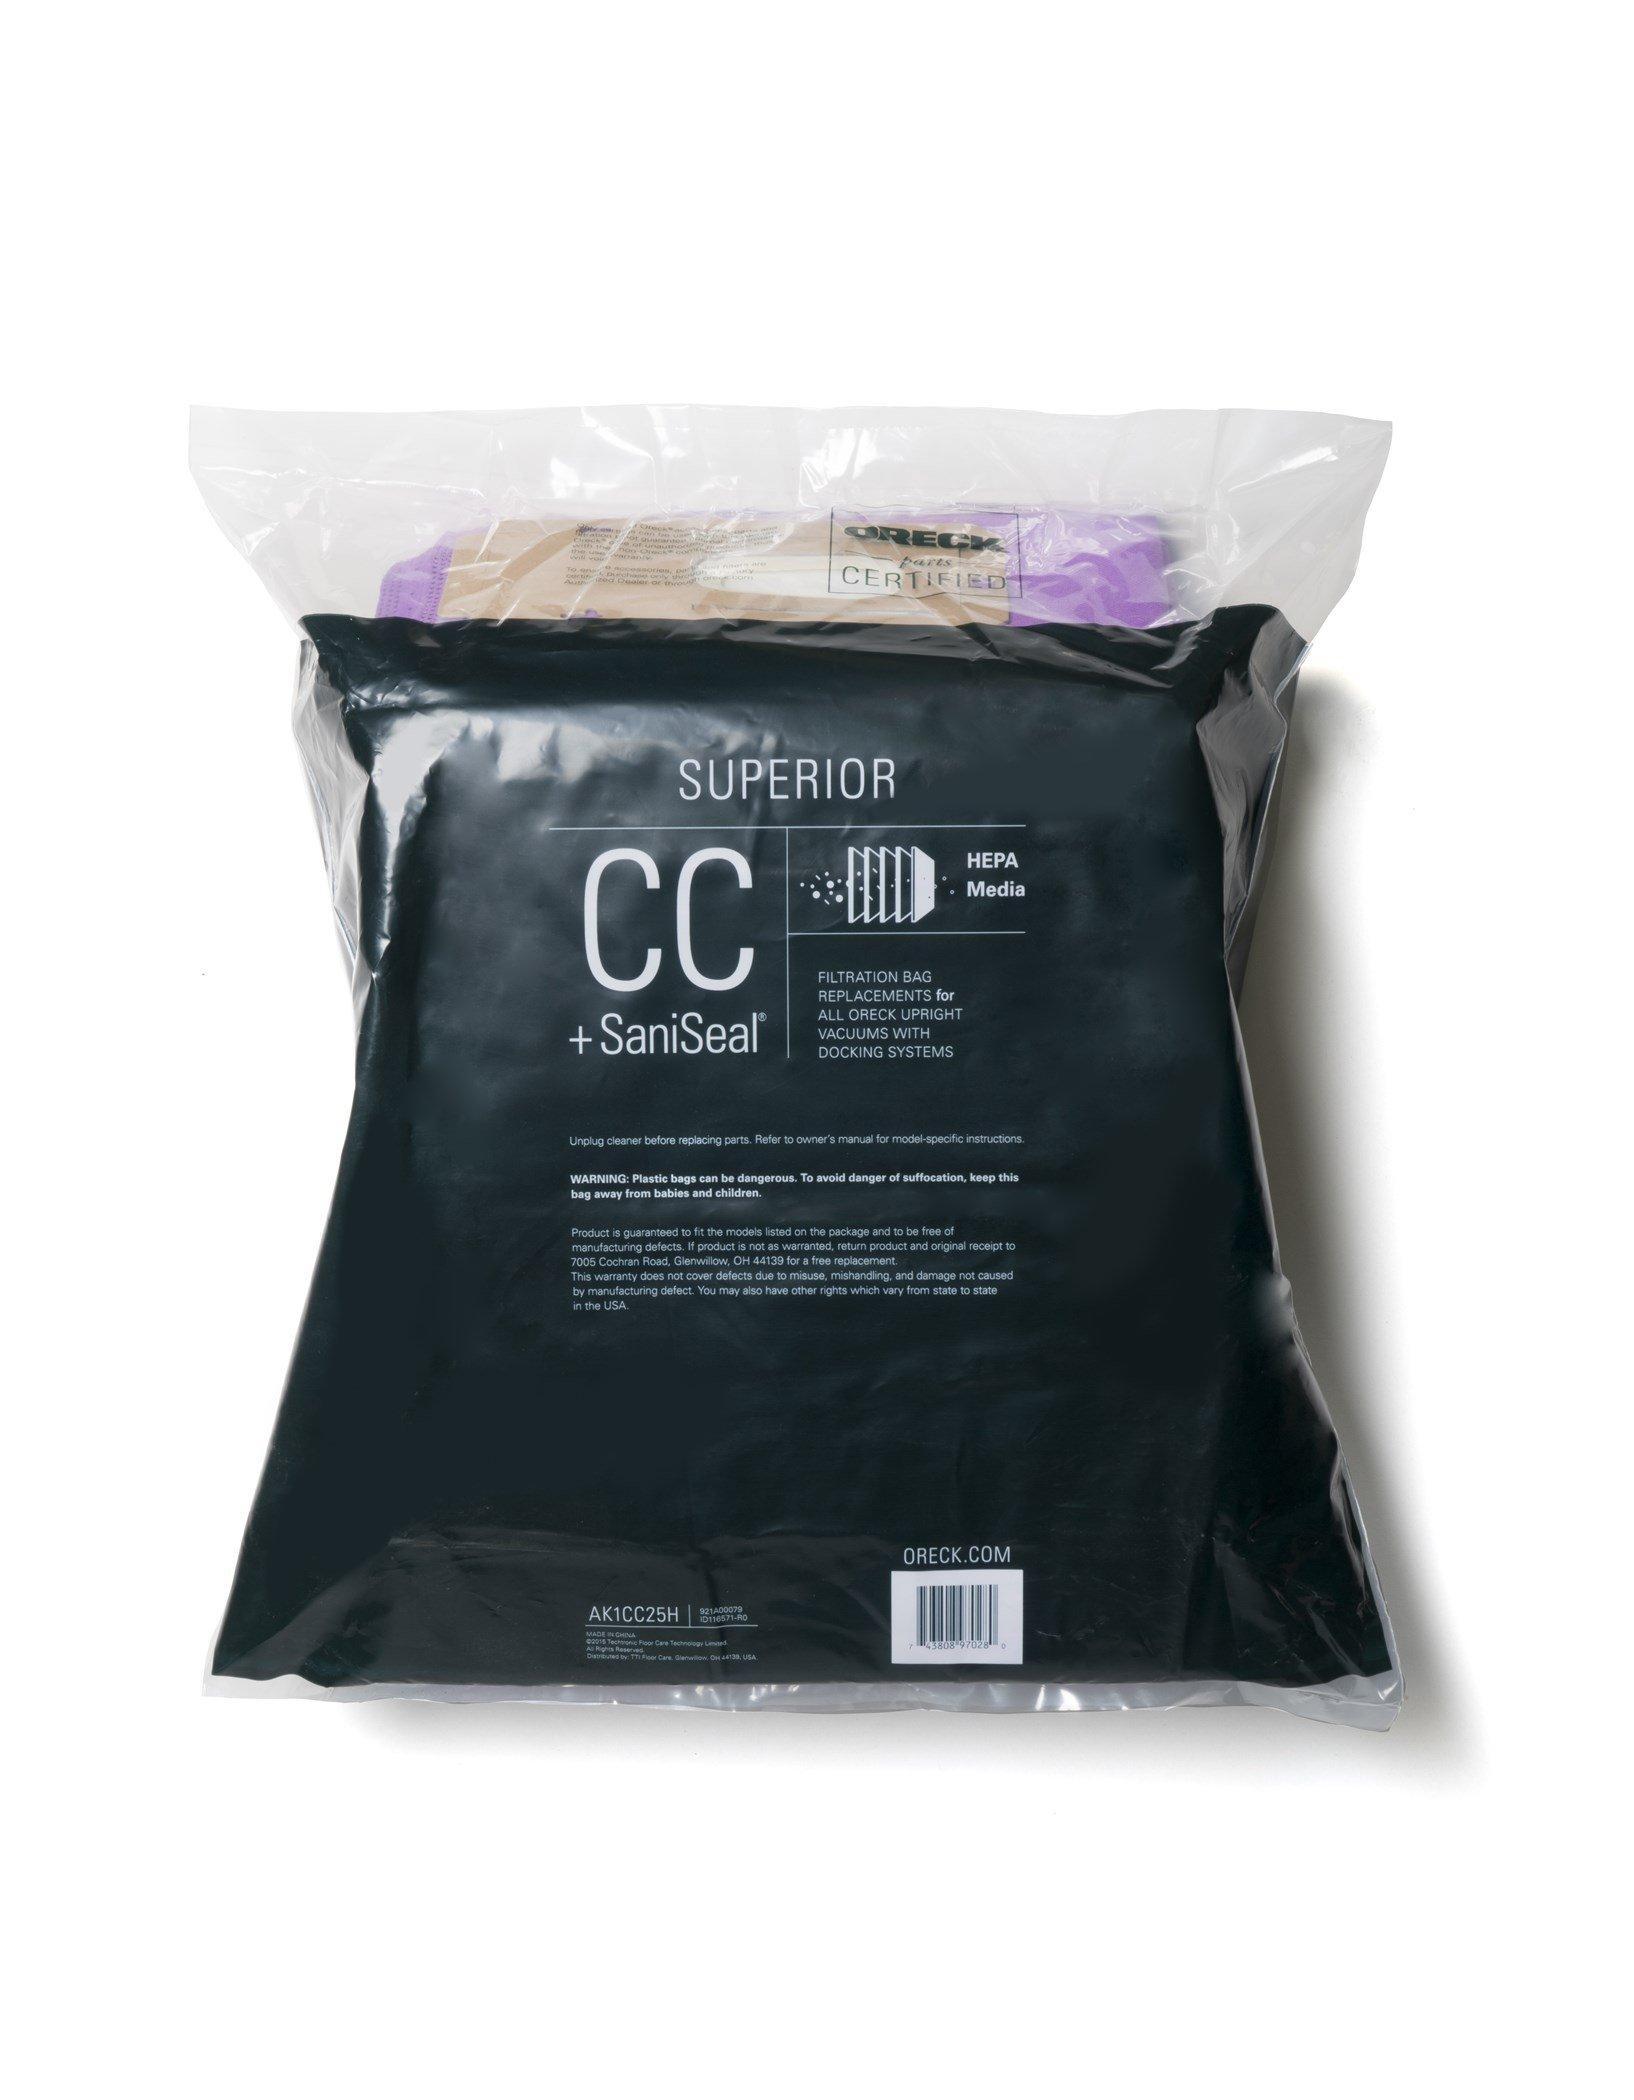 SUPERIOR Filtration Vacuum Bags (25pk)4